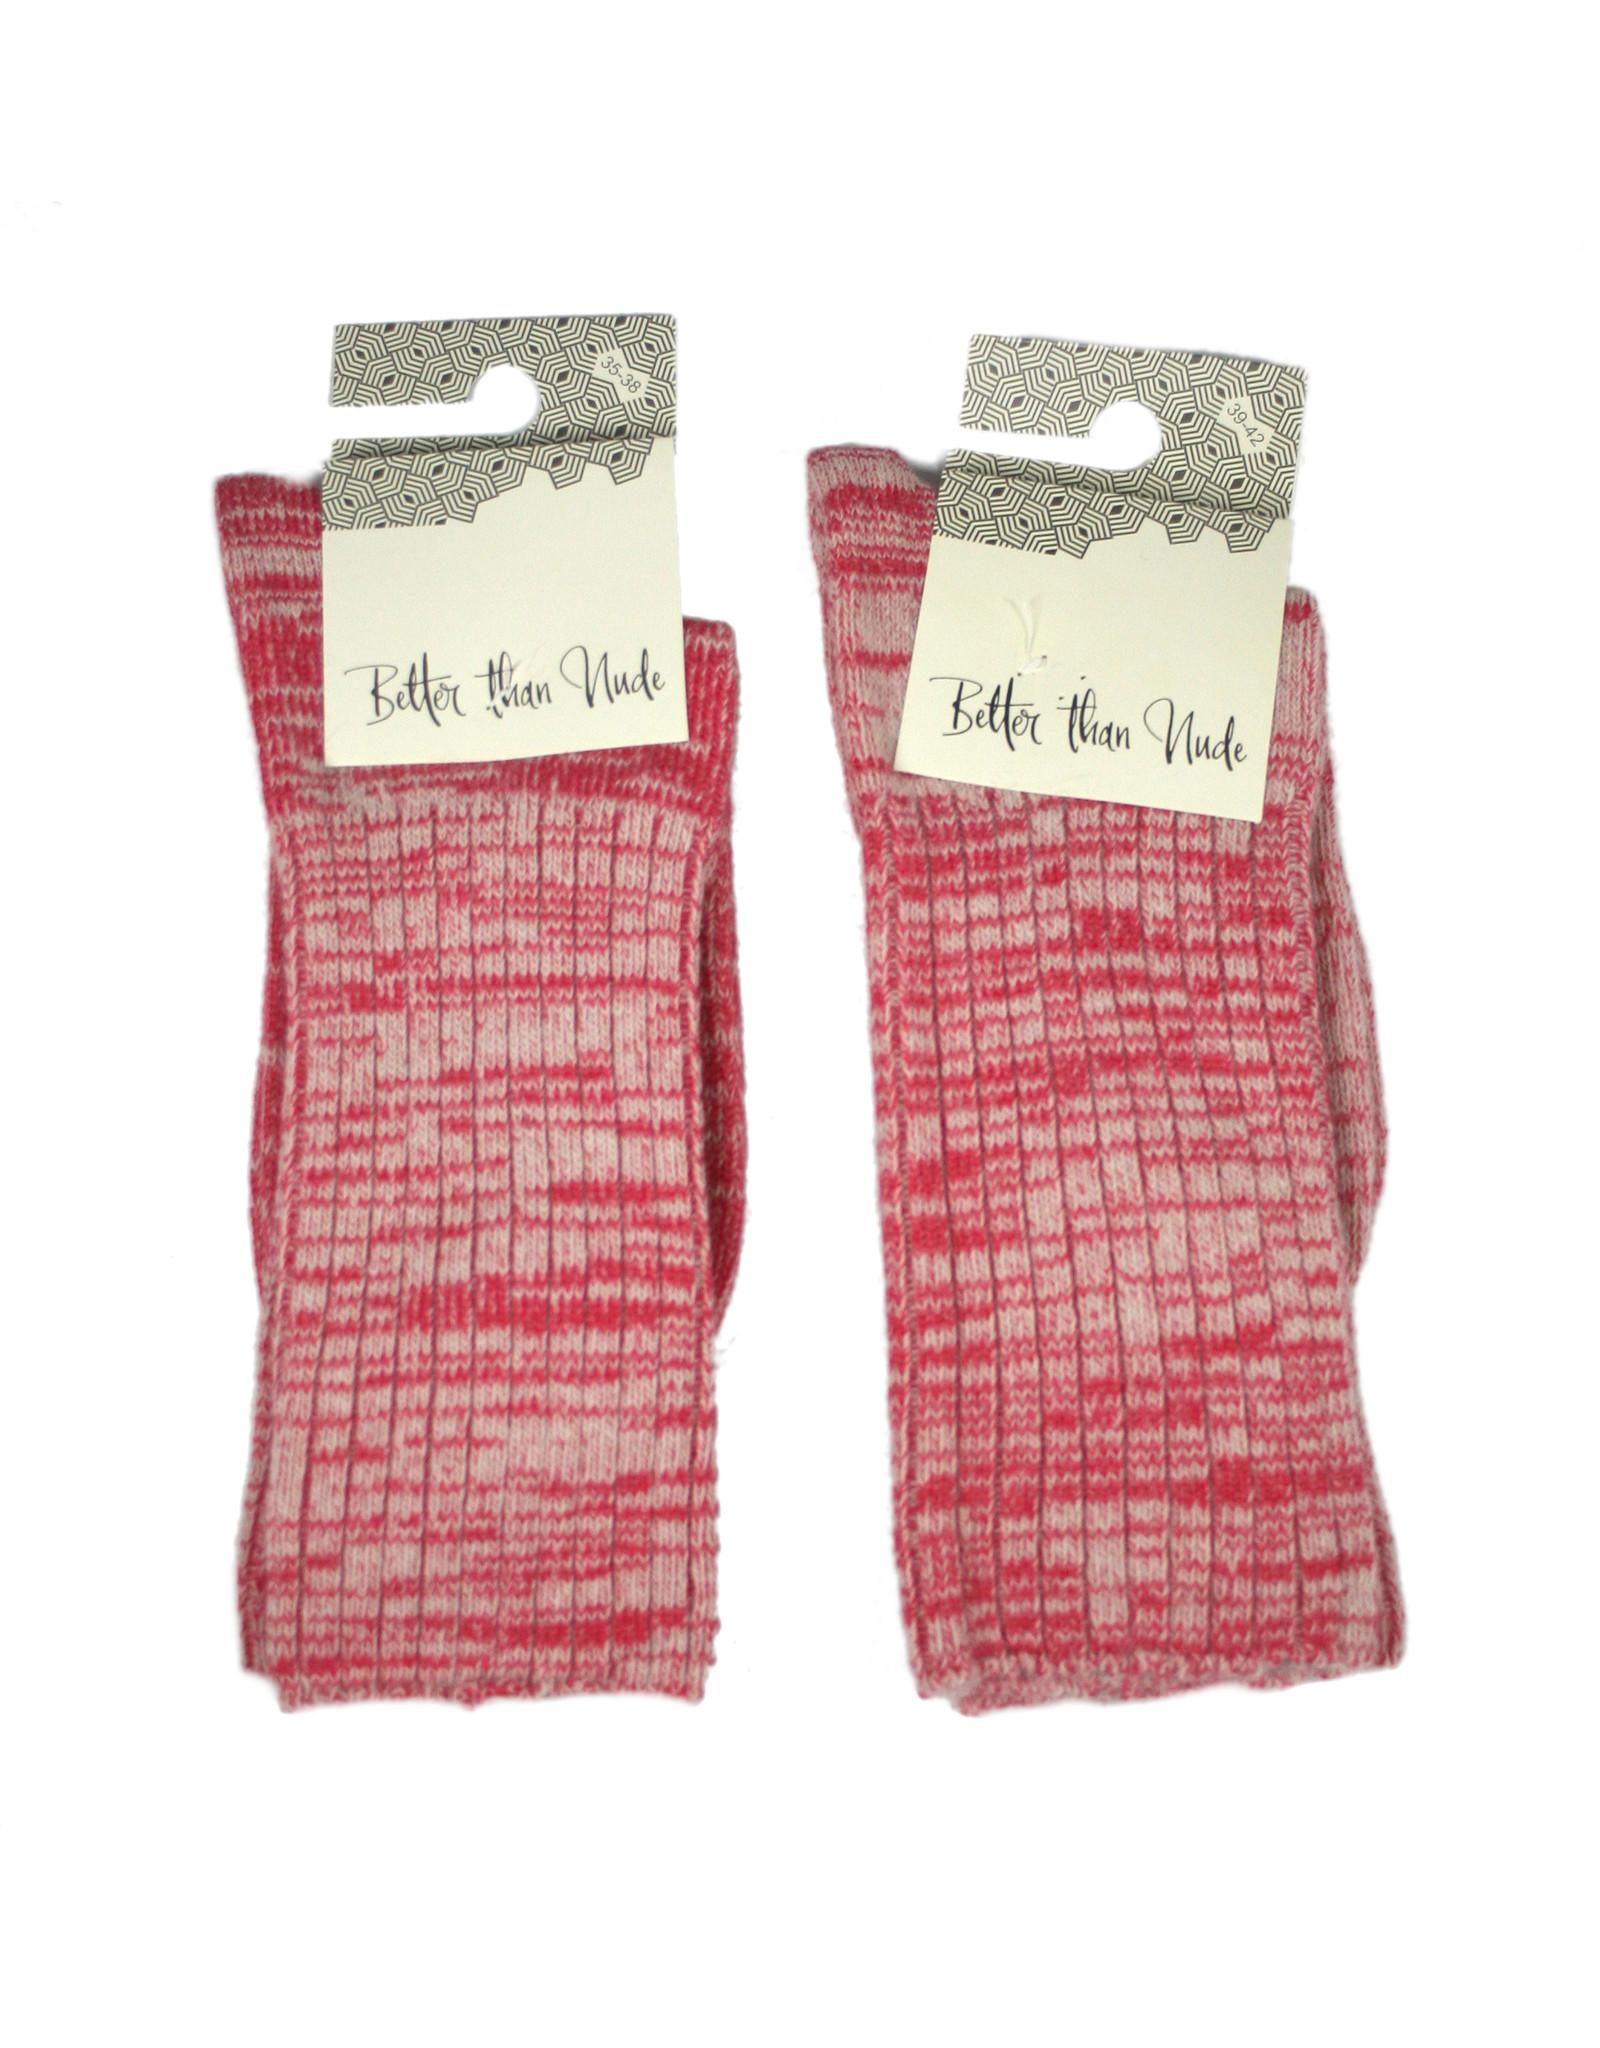 bls organic socks wool and cotton socks, melange yarn